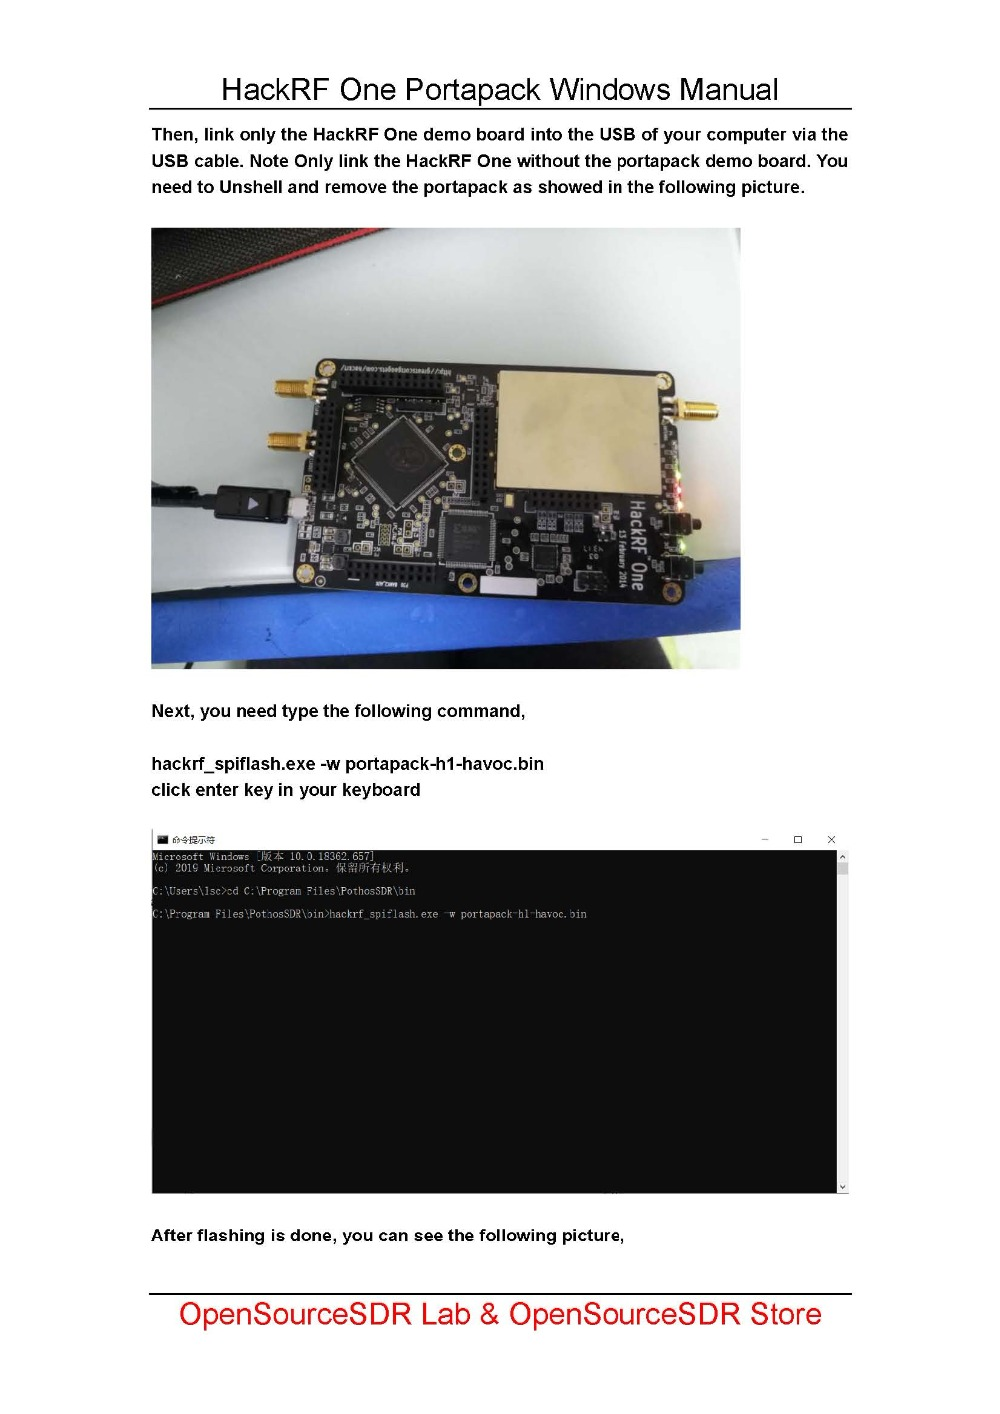 HackRF portapack windows_页面_12